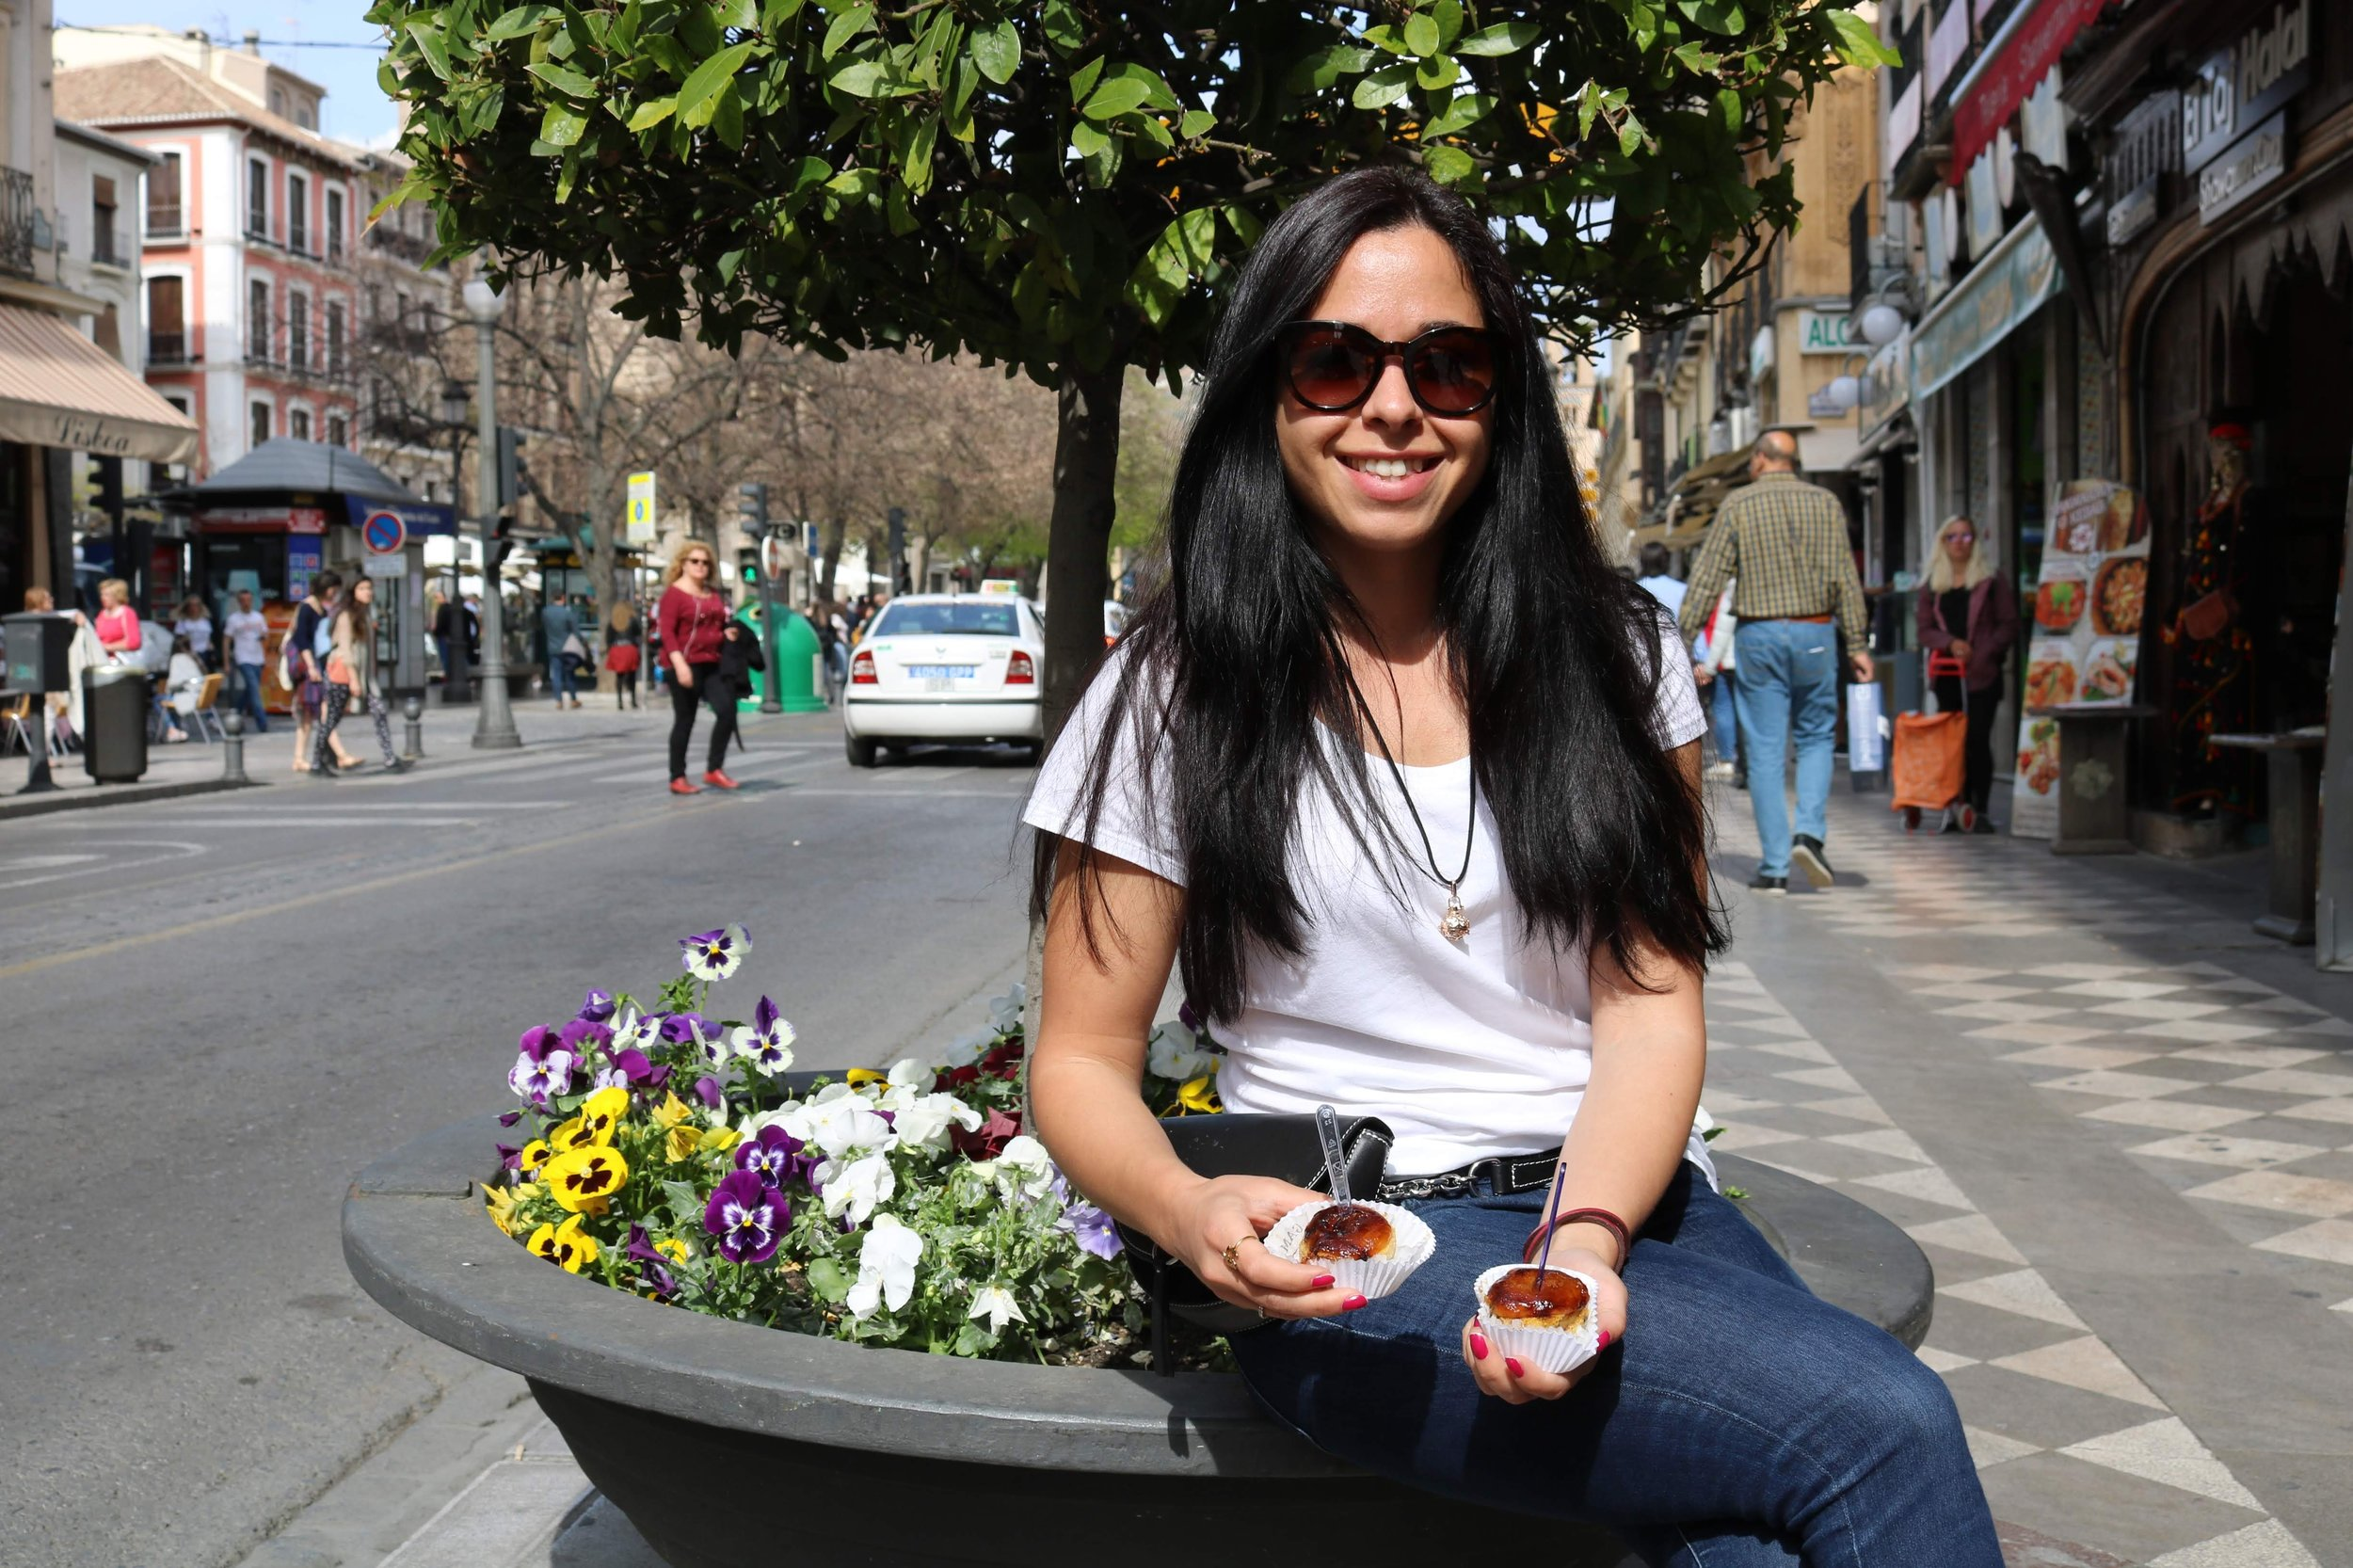 Melisa trying Piononos, the traditional pastry of Granada